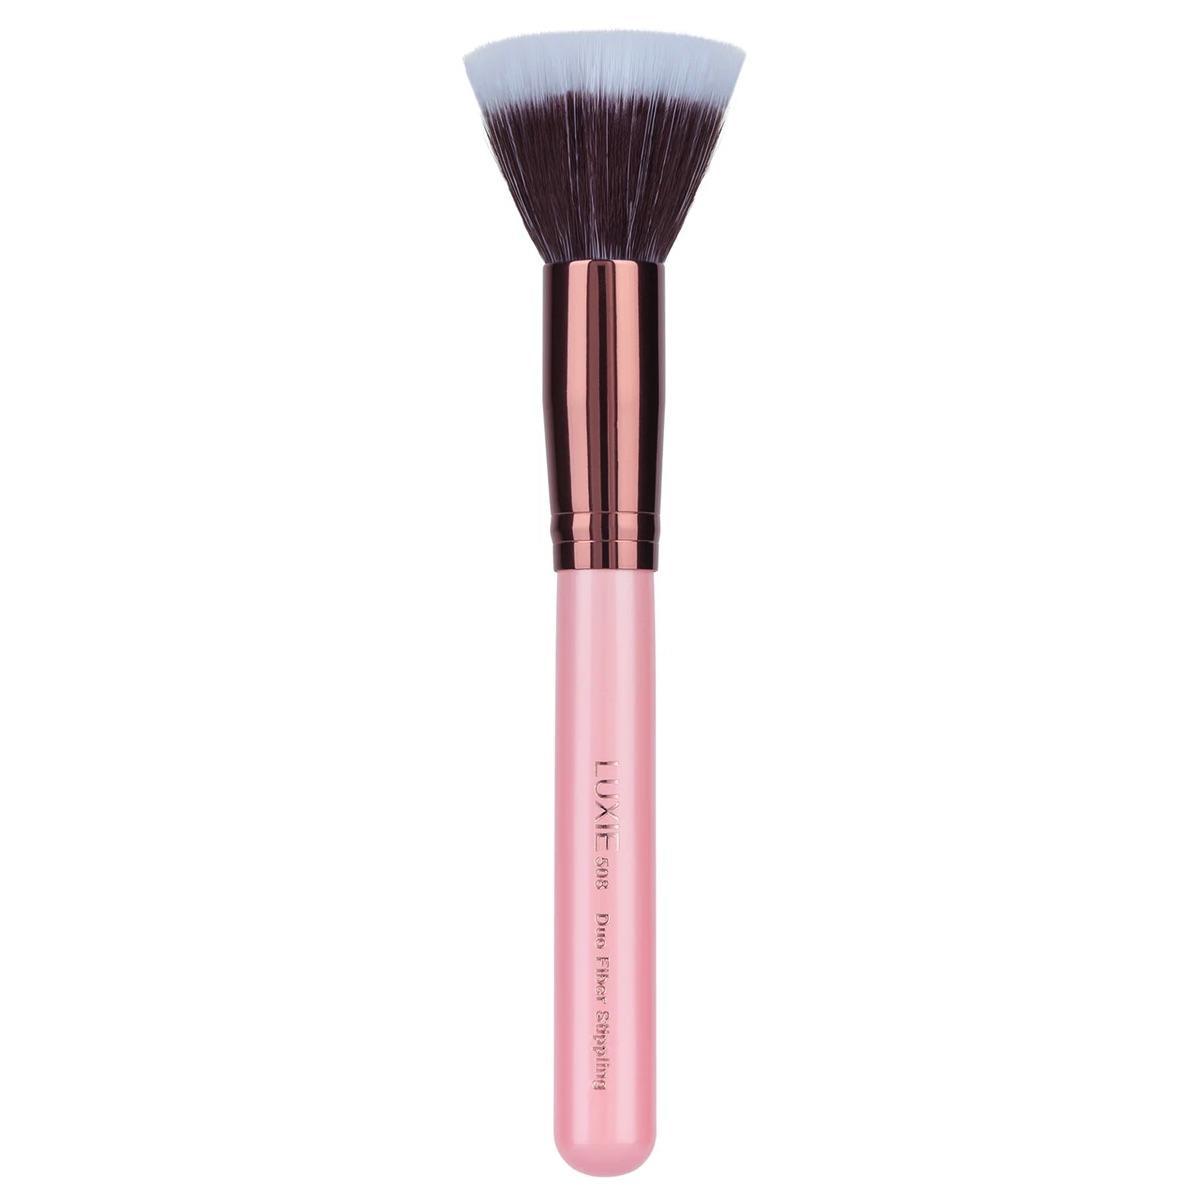 LUXIE Duo Fiber Stippling Face Brush 508